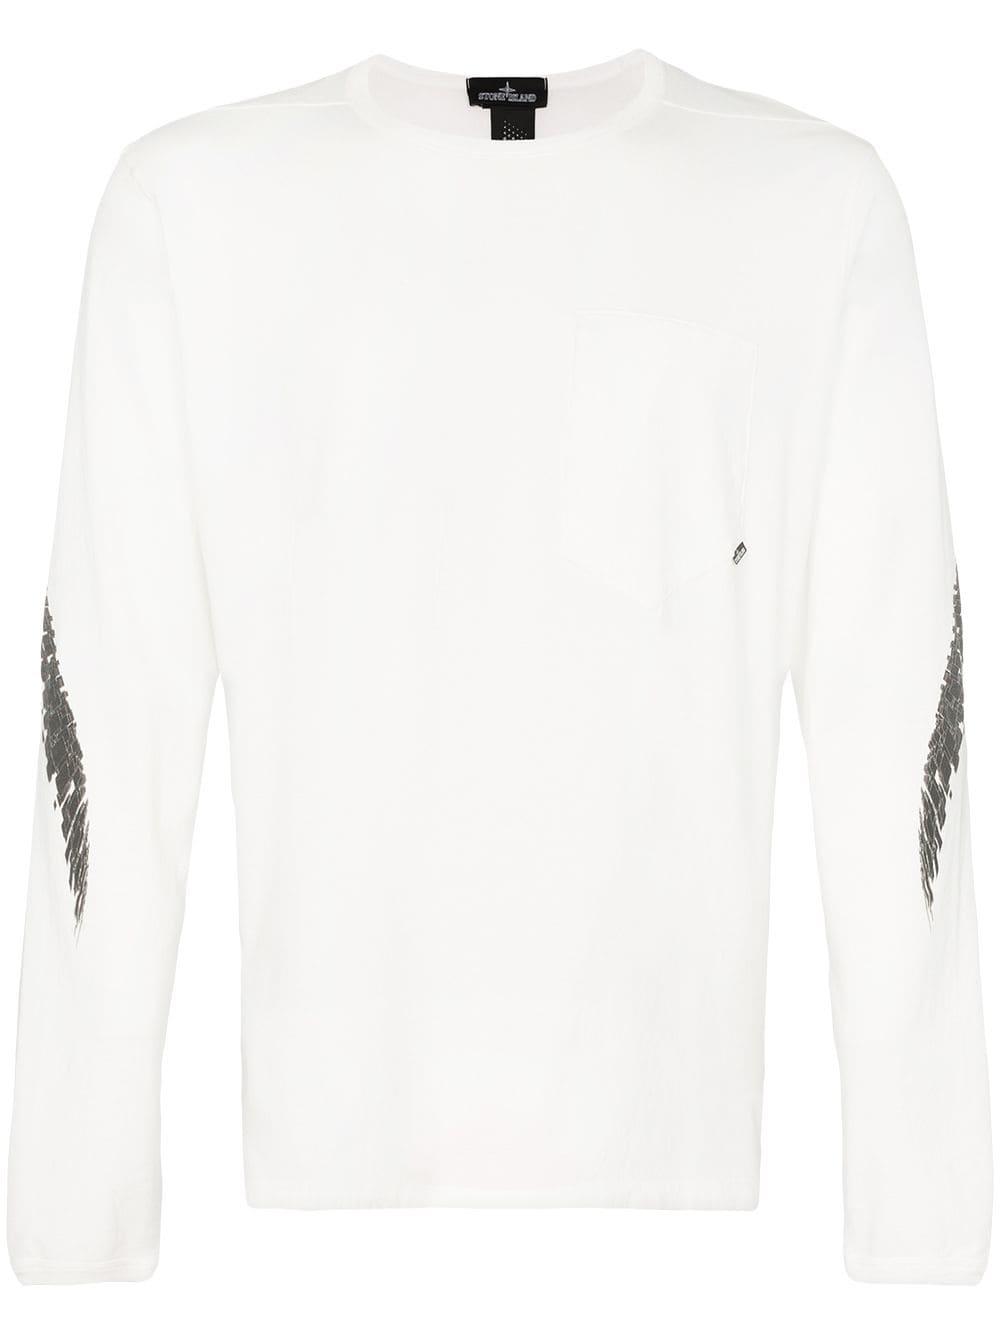 2e7da213593f Stone Island Shadow Project Printed 'Cxado' long sleeved cotton T-shirt -  White